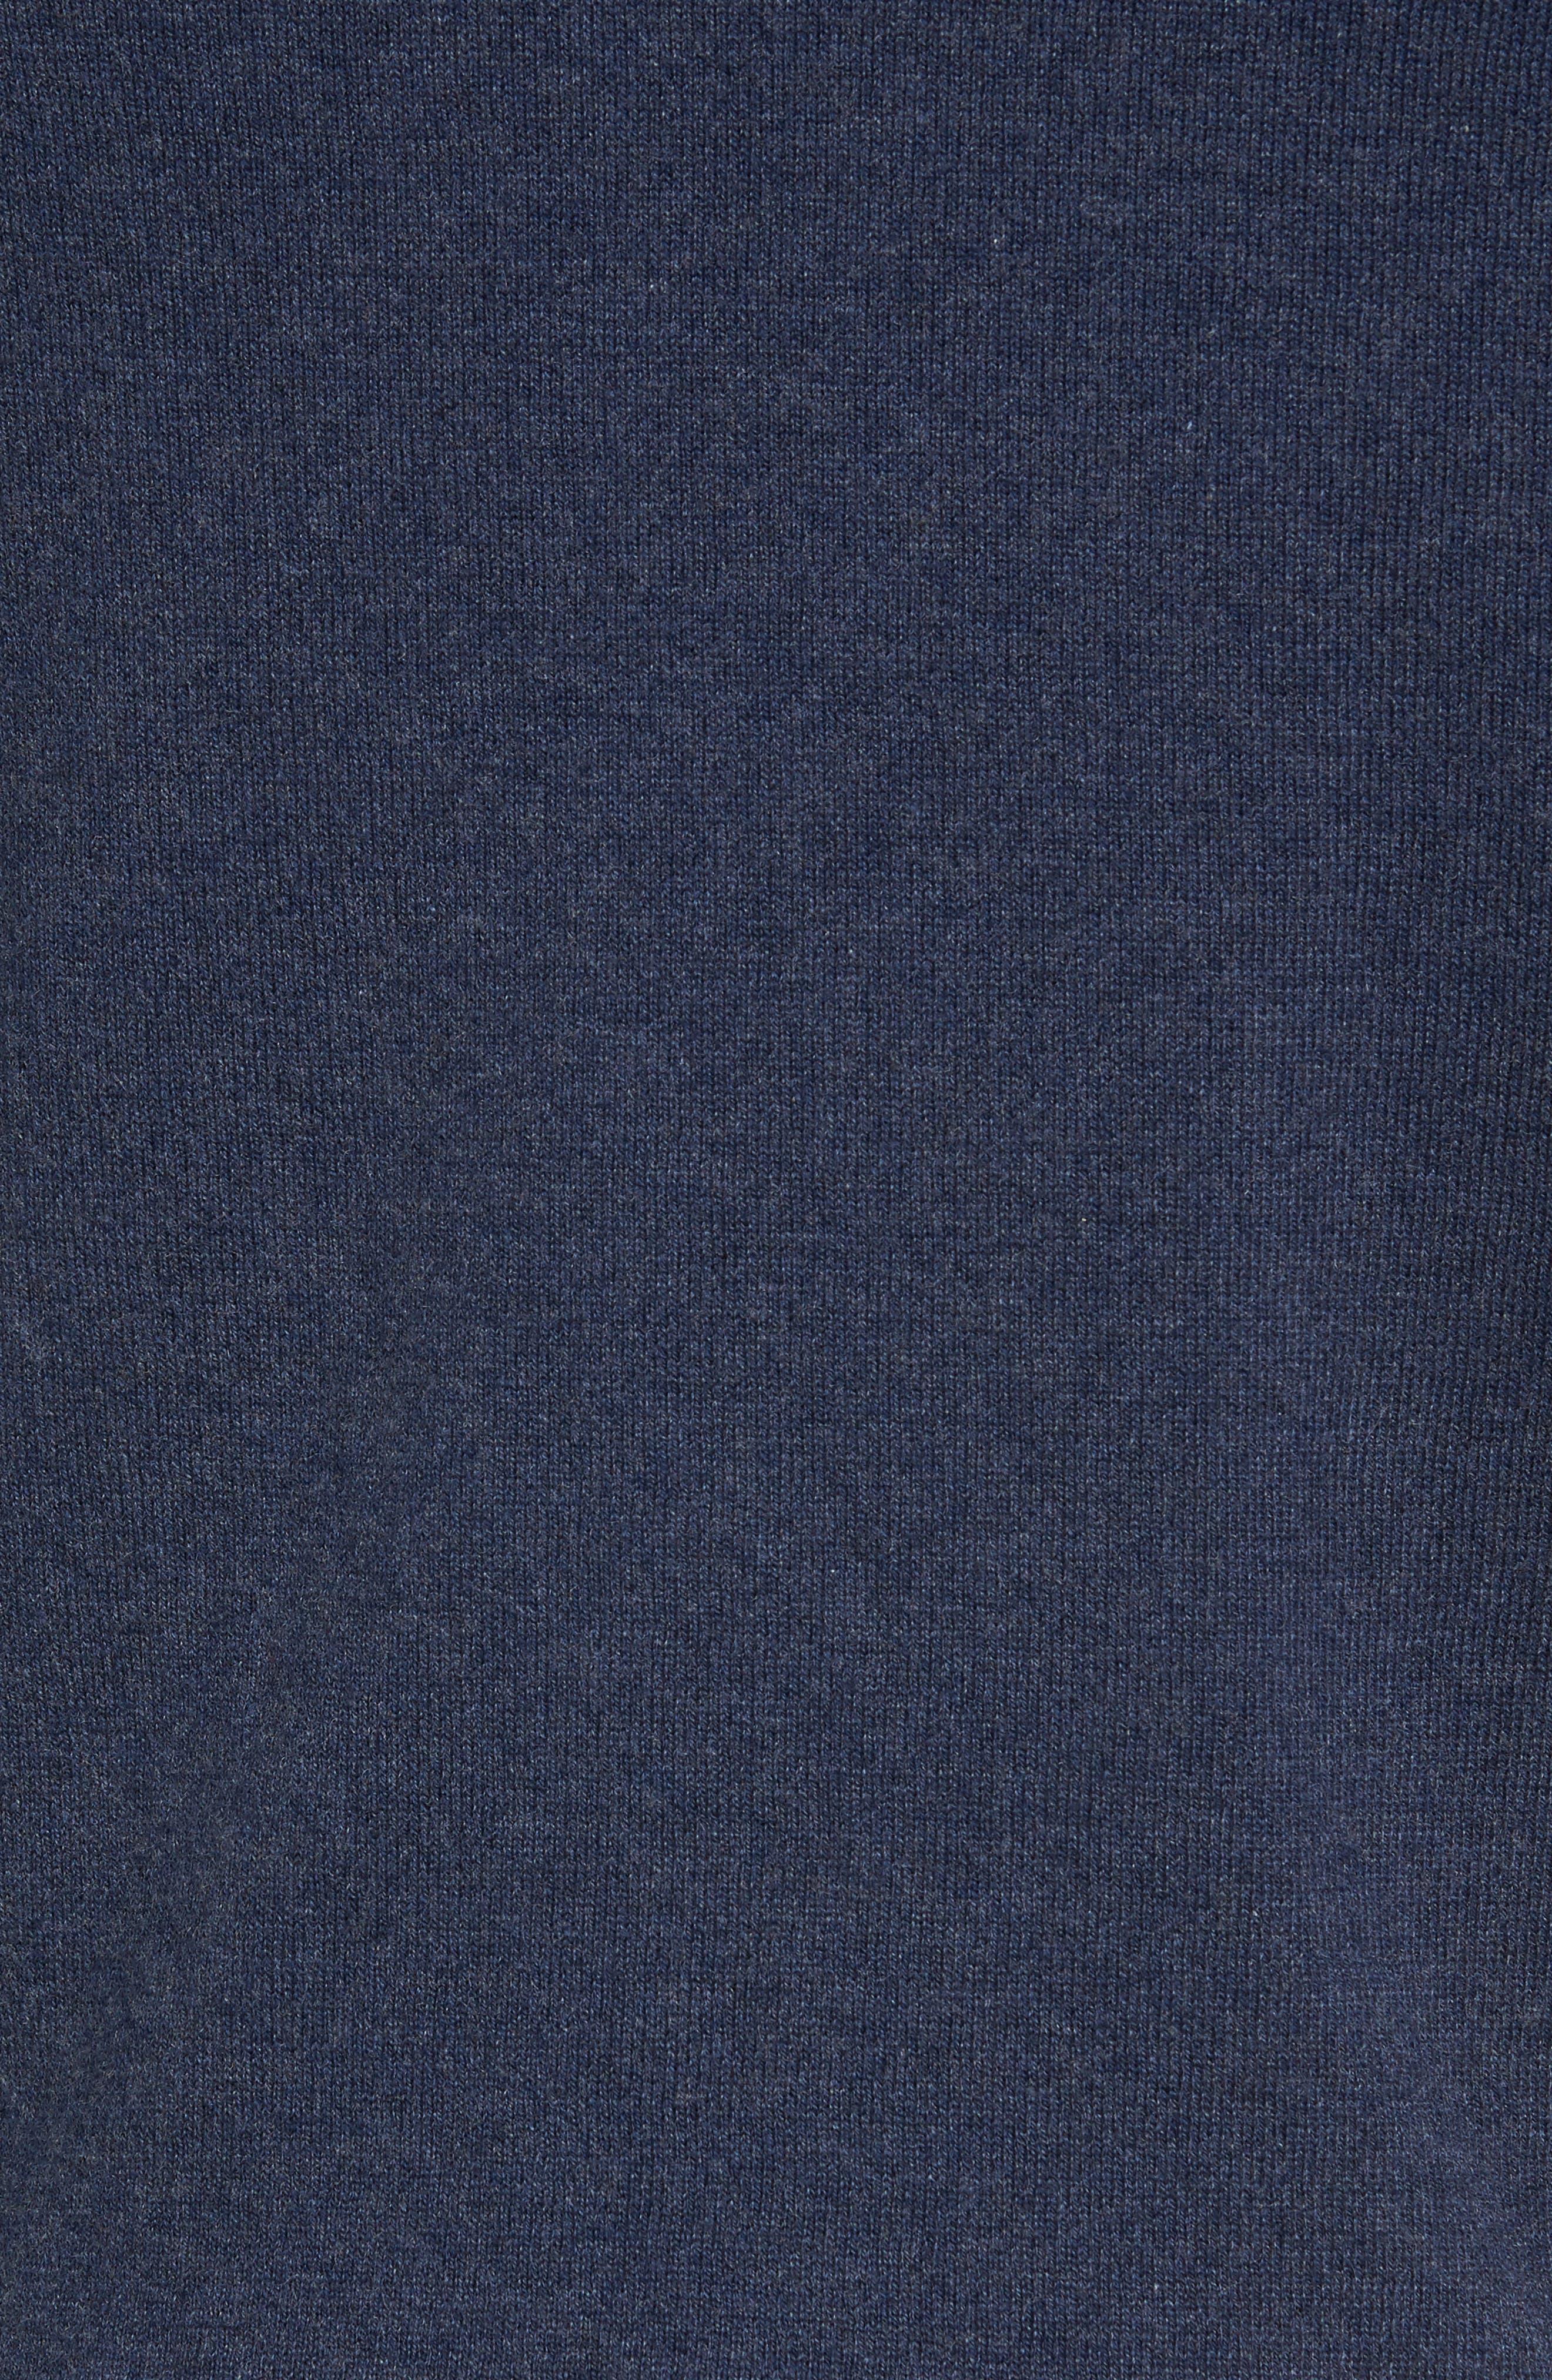 Alternate Image 5  - Nordstrom Men's Shop Cotton & Cashmere Shawl Collar Sweater (Regular & Tall)